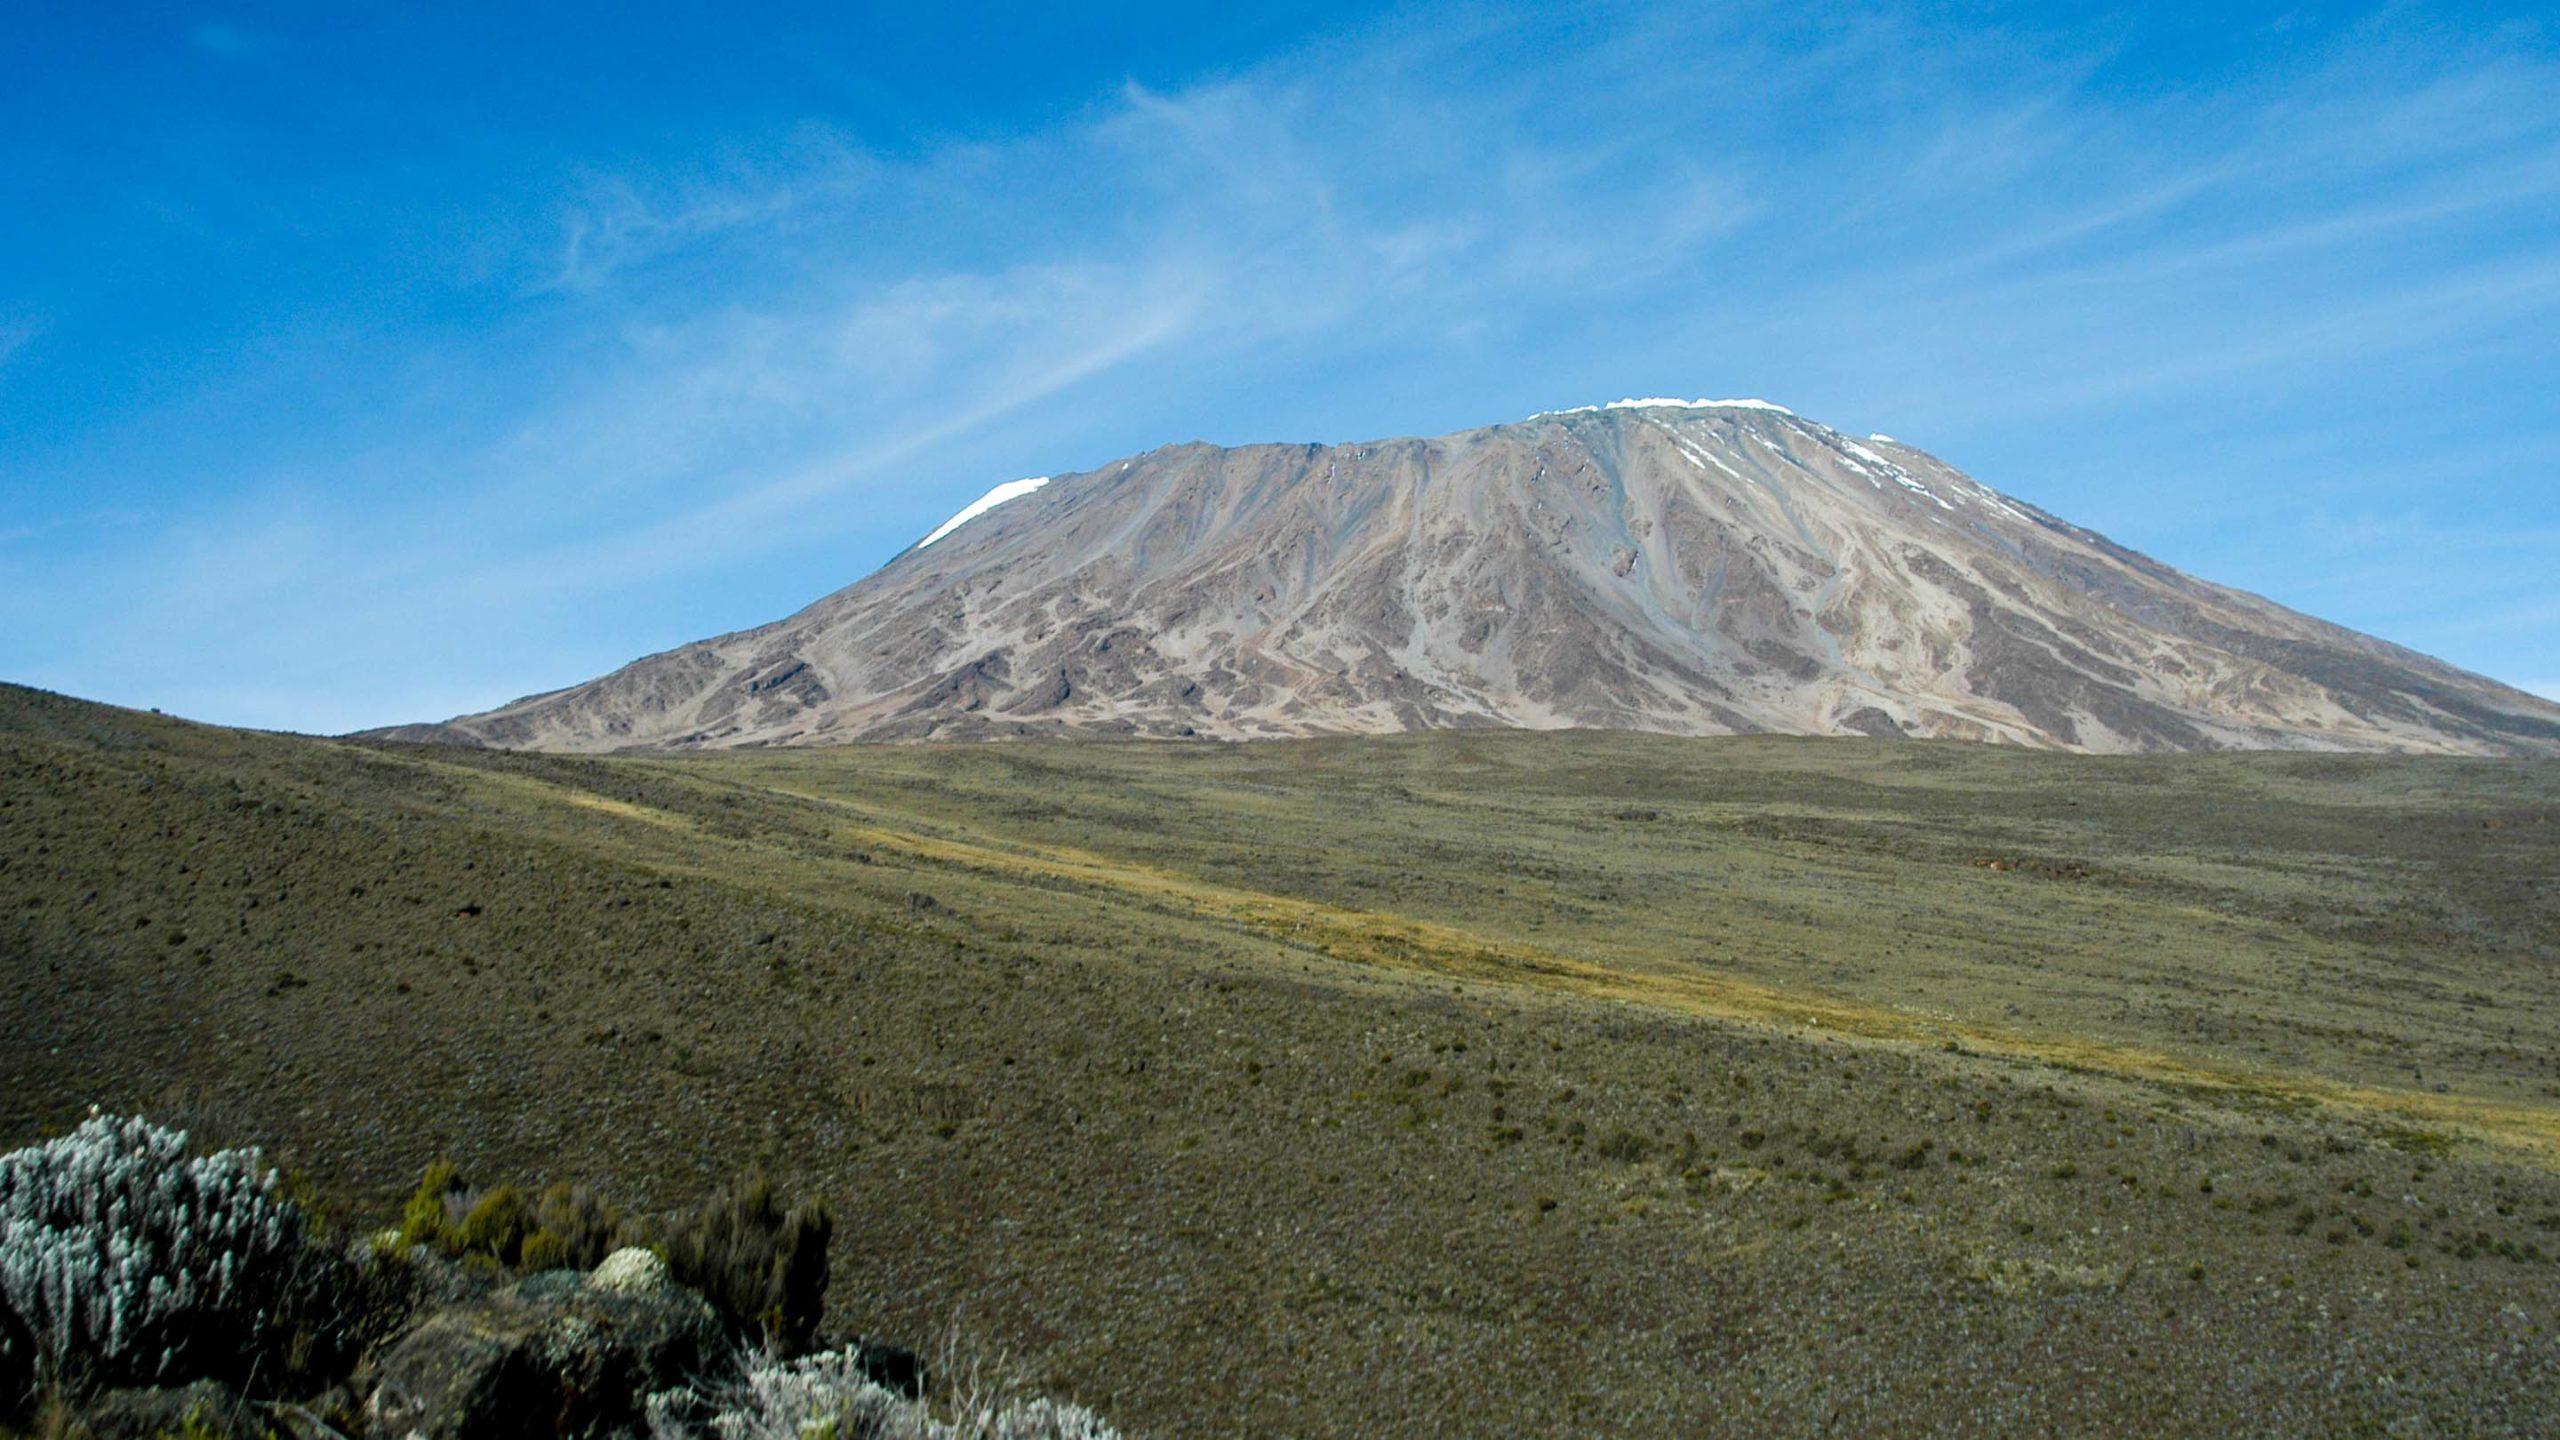 Know About Climbing Kilimanjaro